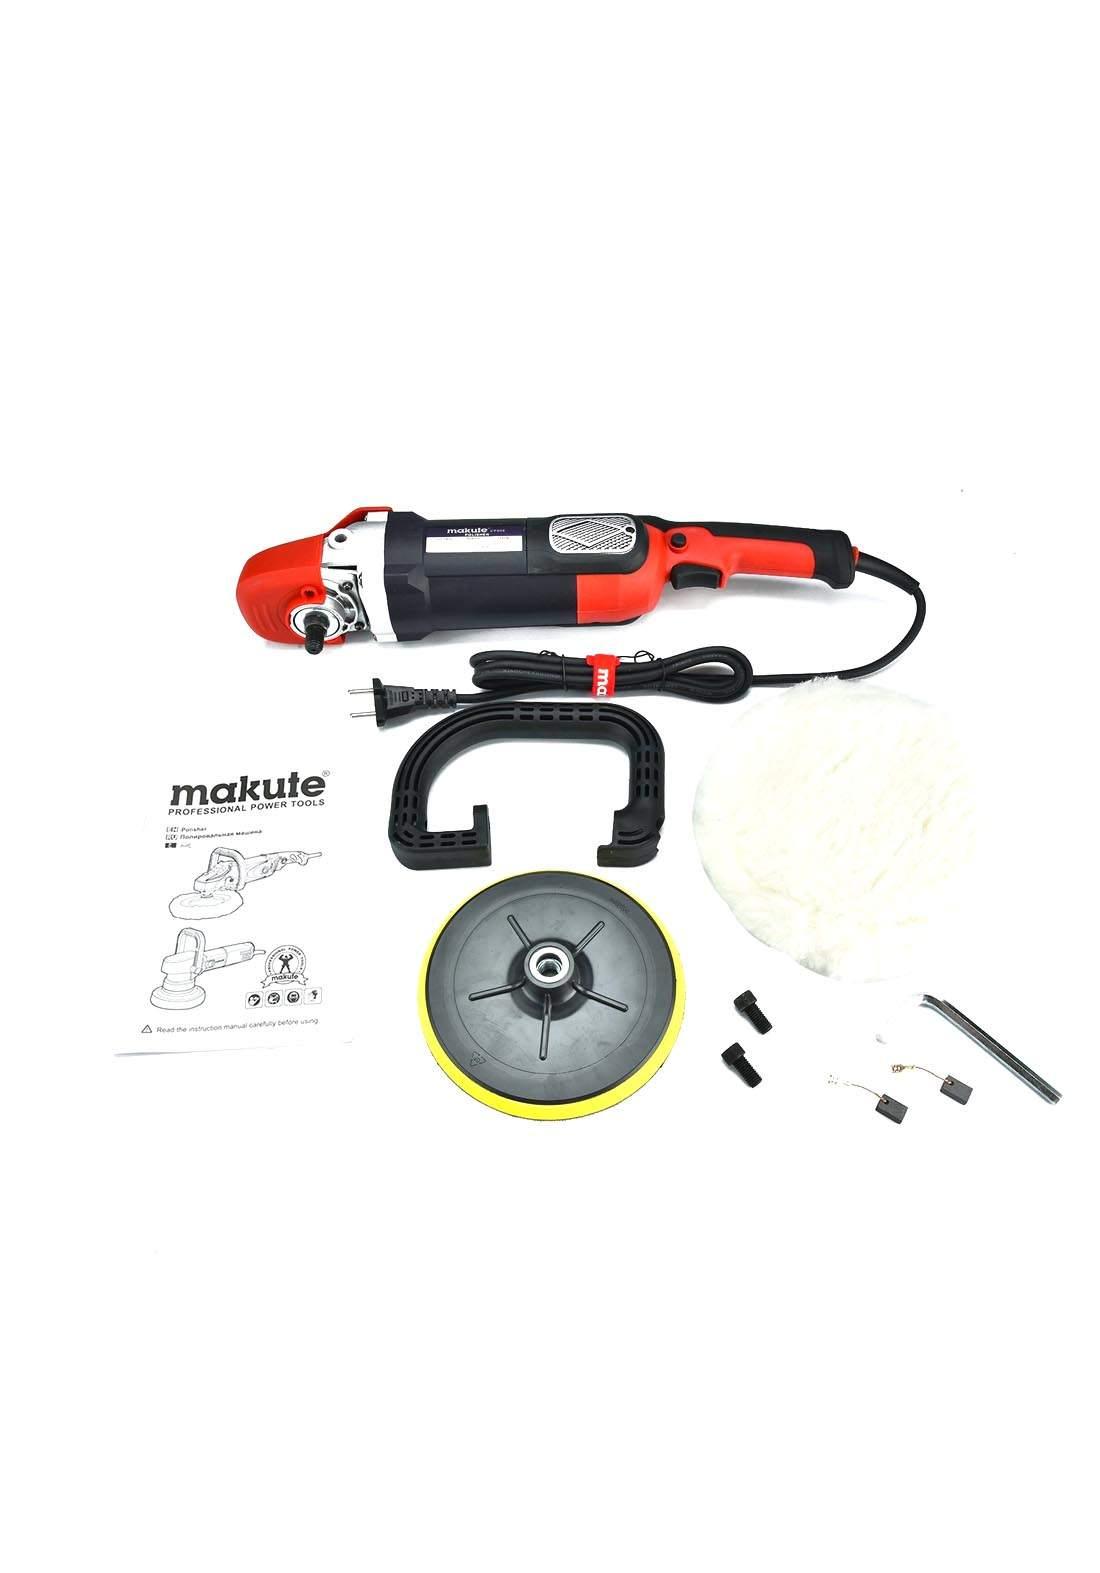 Makute CP006 Power Tools 1680W 150 mm Granite Polisher كوسرة  تلميع